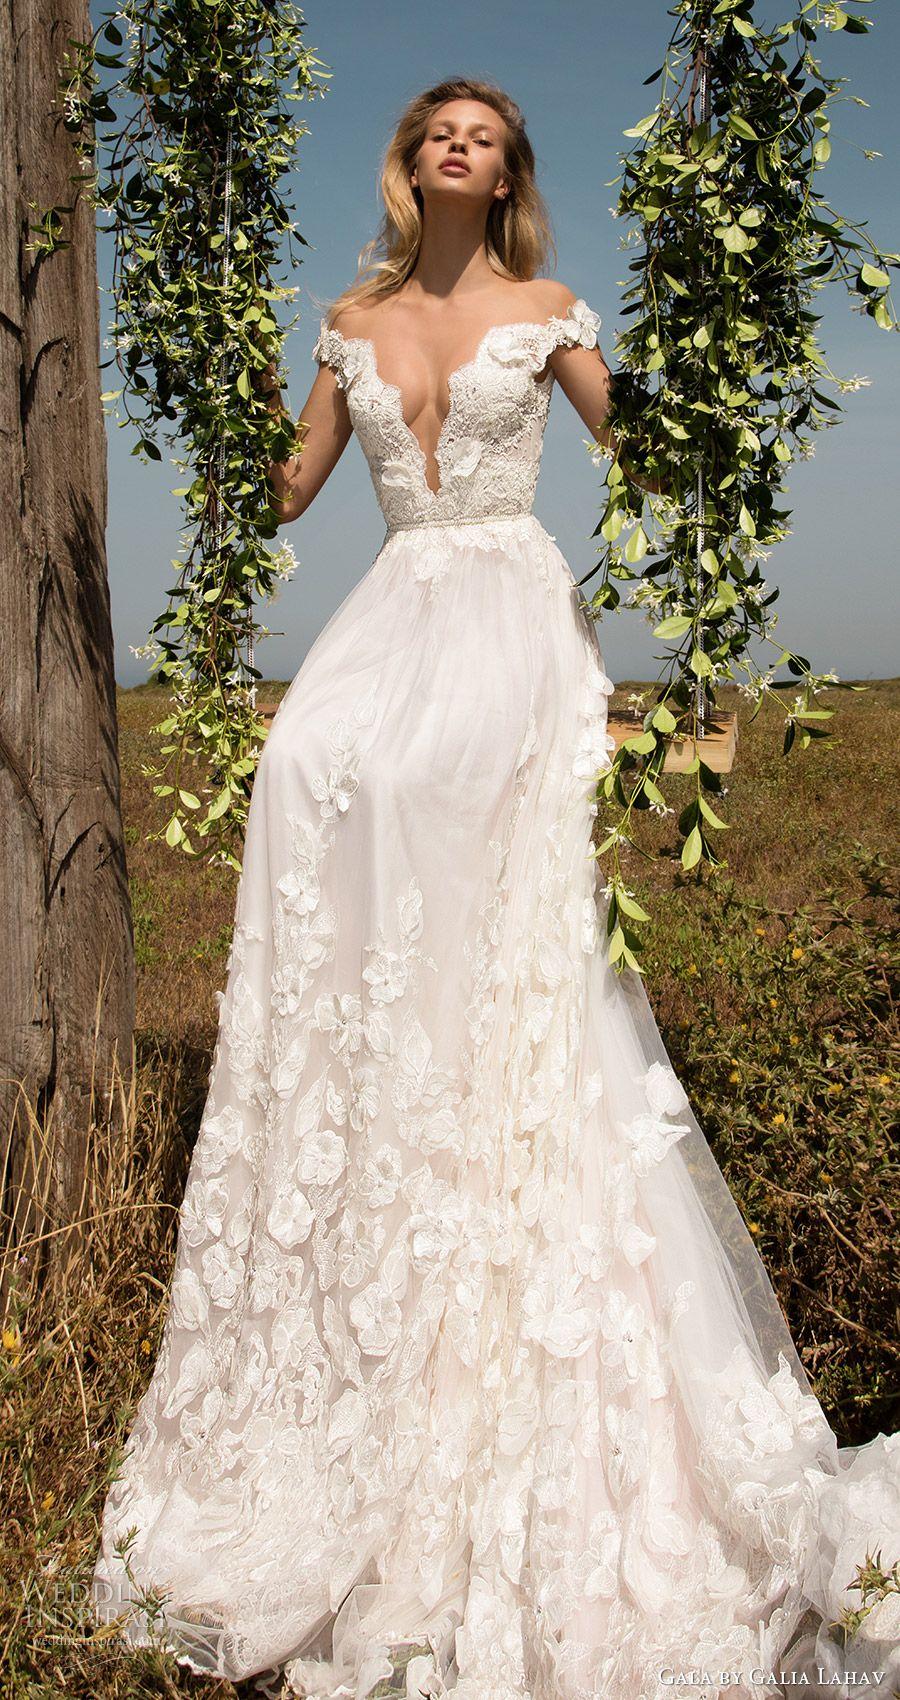 Gala by galia lahav spring 2017 wedding dresses gala no ii gala by galia lahav spring 2017 wedding dresses gala no ii bridal collection junglespirit Gallery